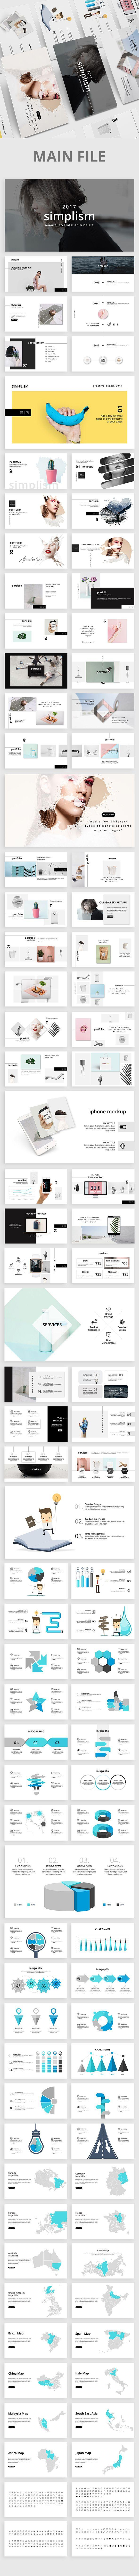 Simplism Minimal Keynote Template — Keynote KEY #keynote presentation #corporate • Available here ➝ https://graphicriver.net/item/simplism-minimal-keynote-template/20895143?ref=pxcr